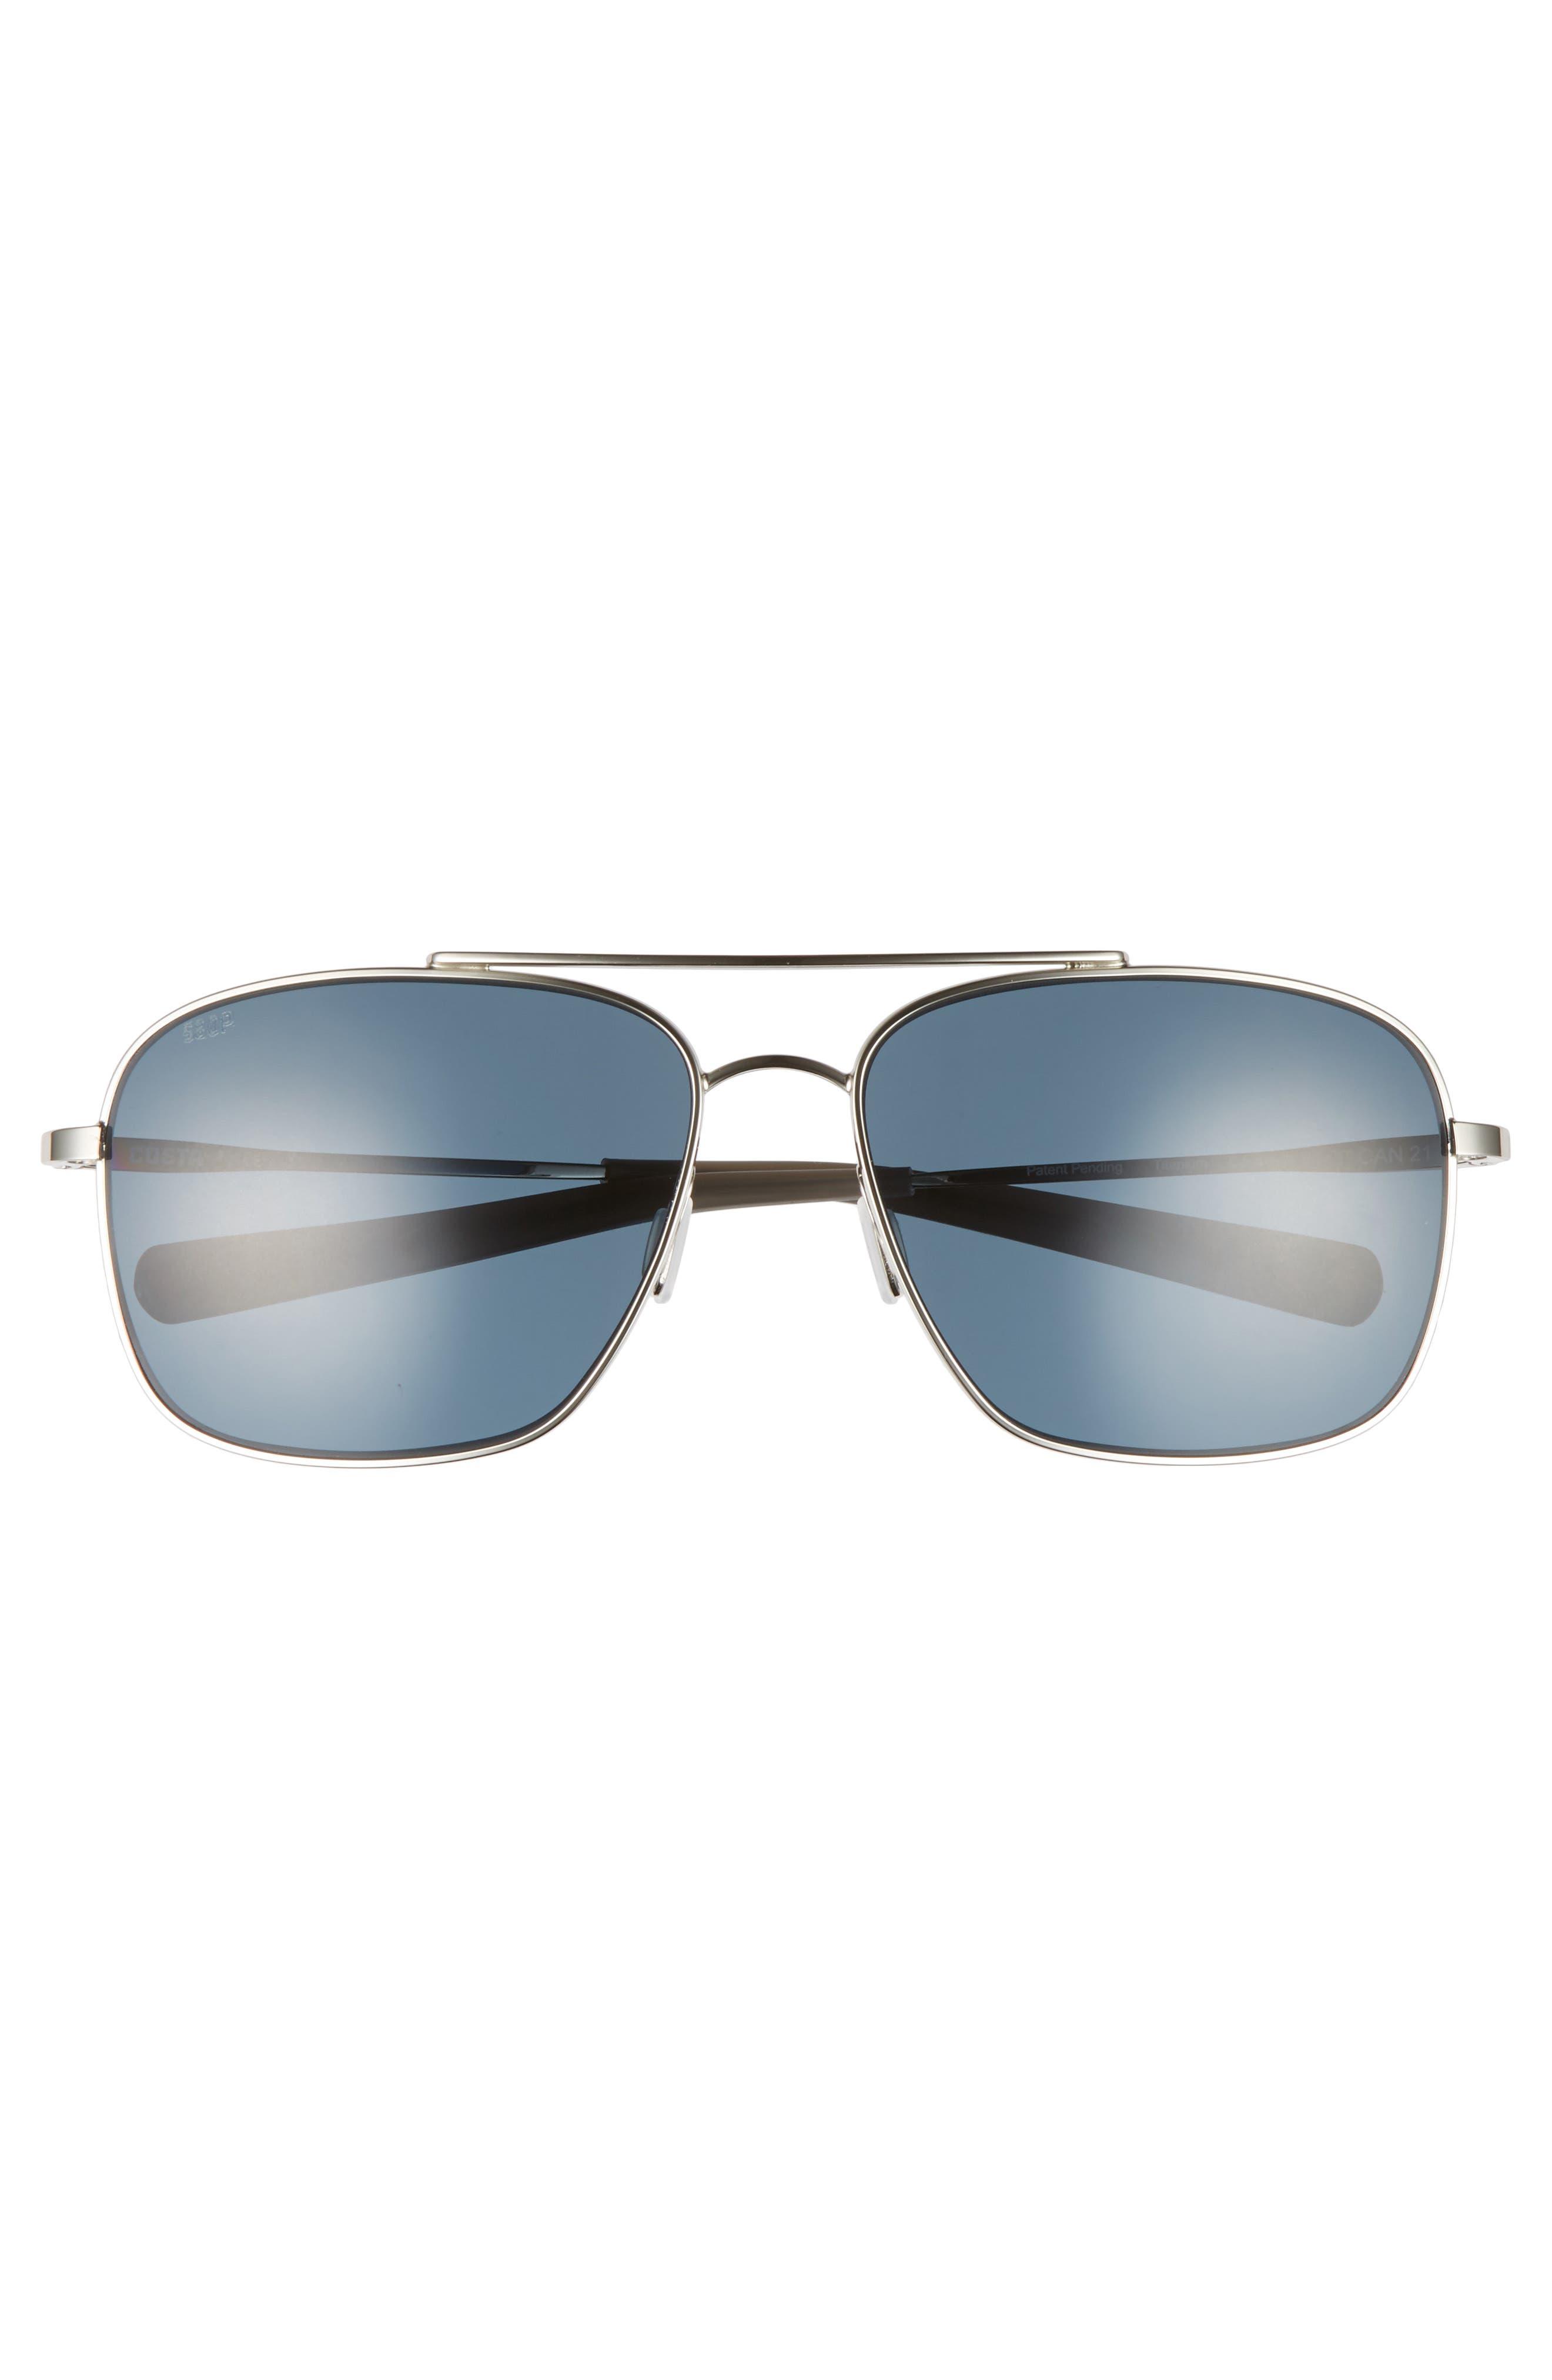 Canaveral 58mm Polarized Sunglasses,                             Alternate thumbnail 2, color,                             Shiny Palladium/ Grey